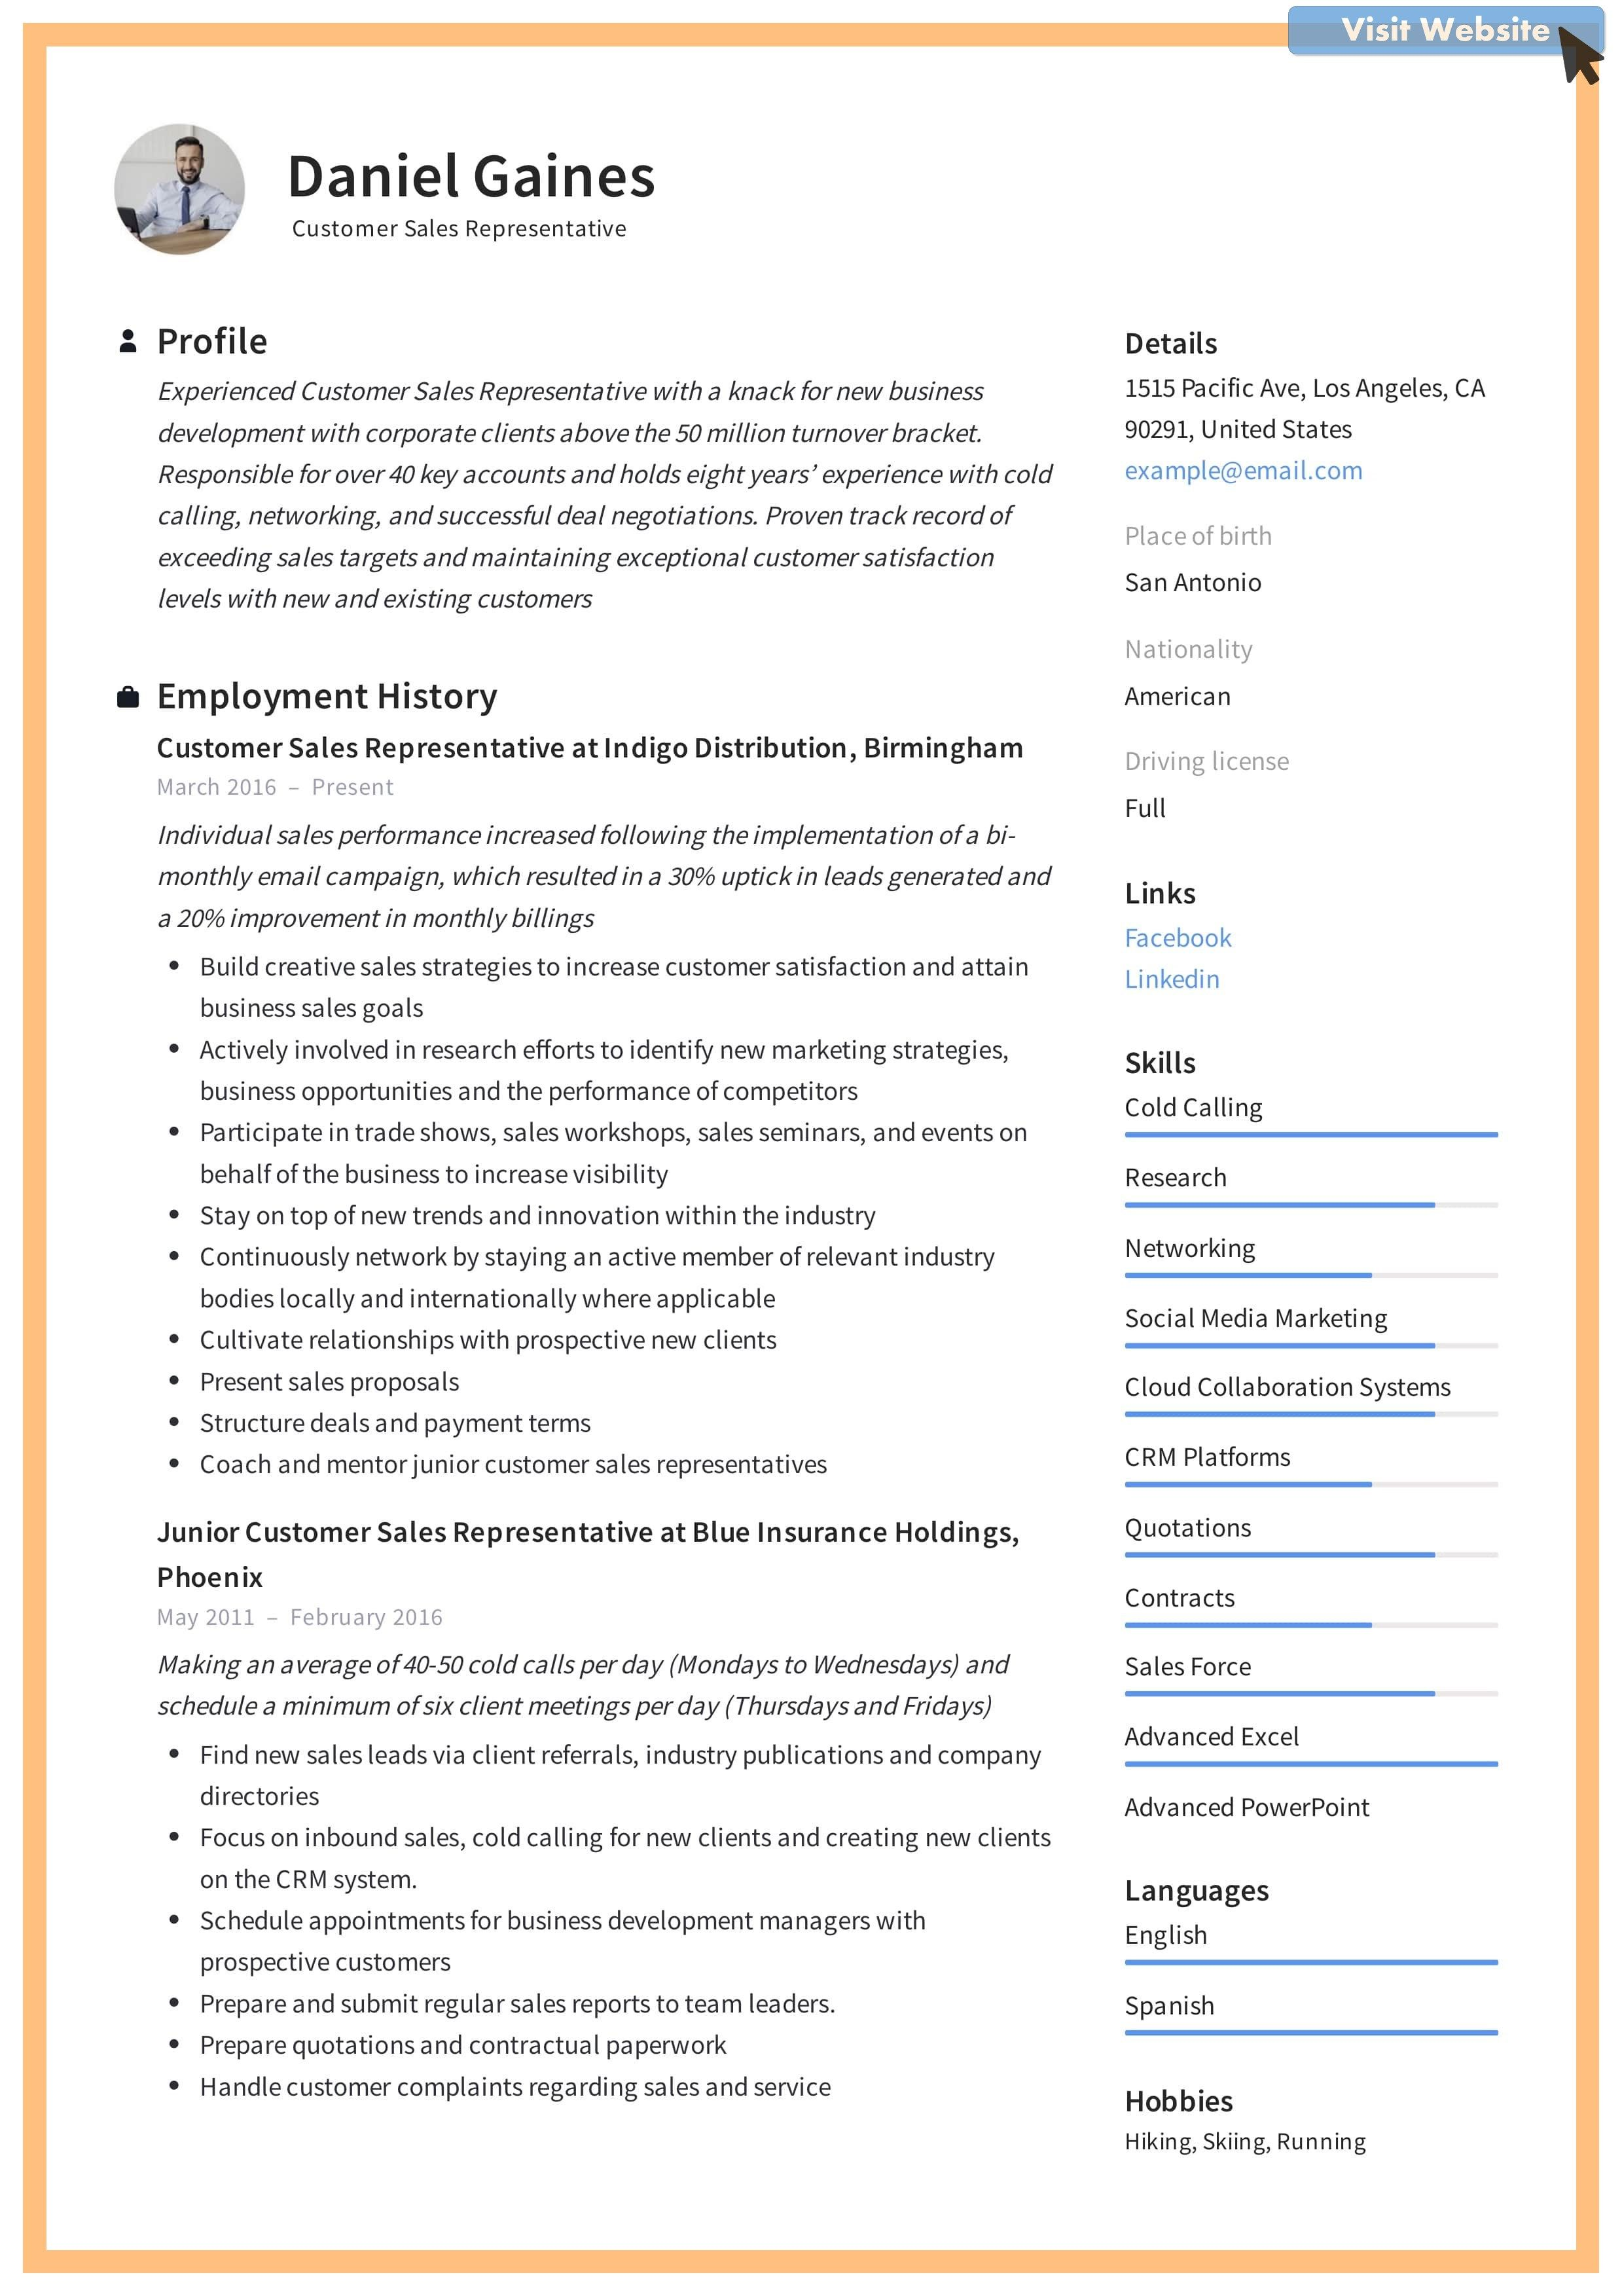 customer service resume template free in 2020 Teacher